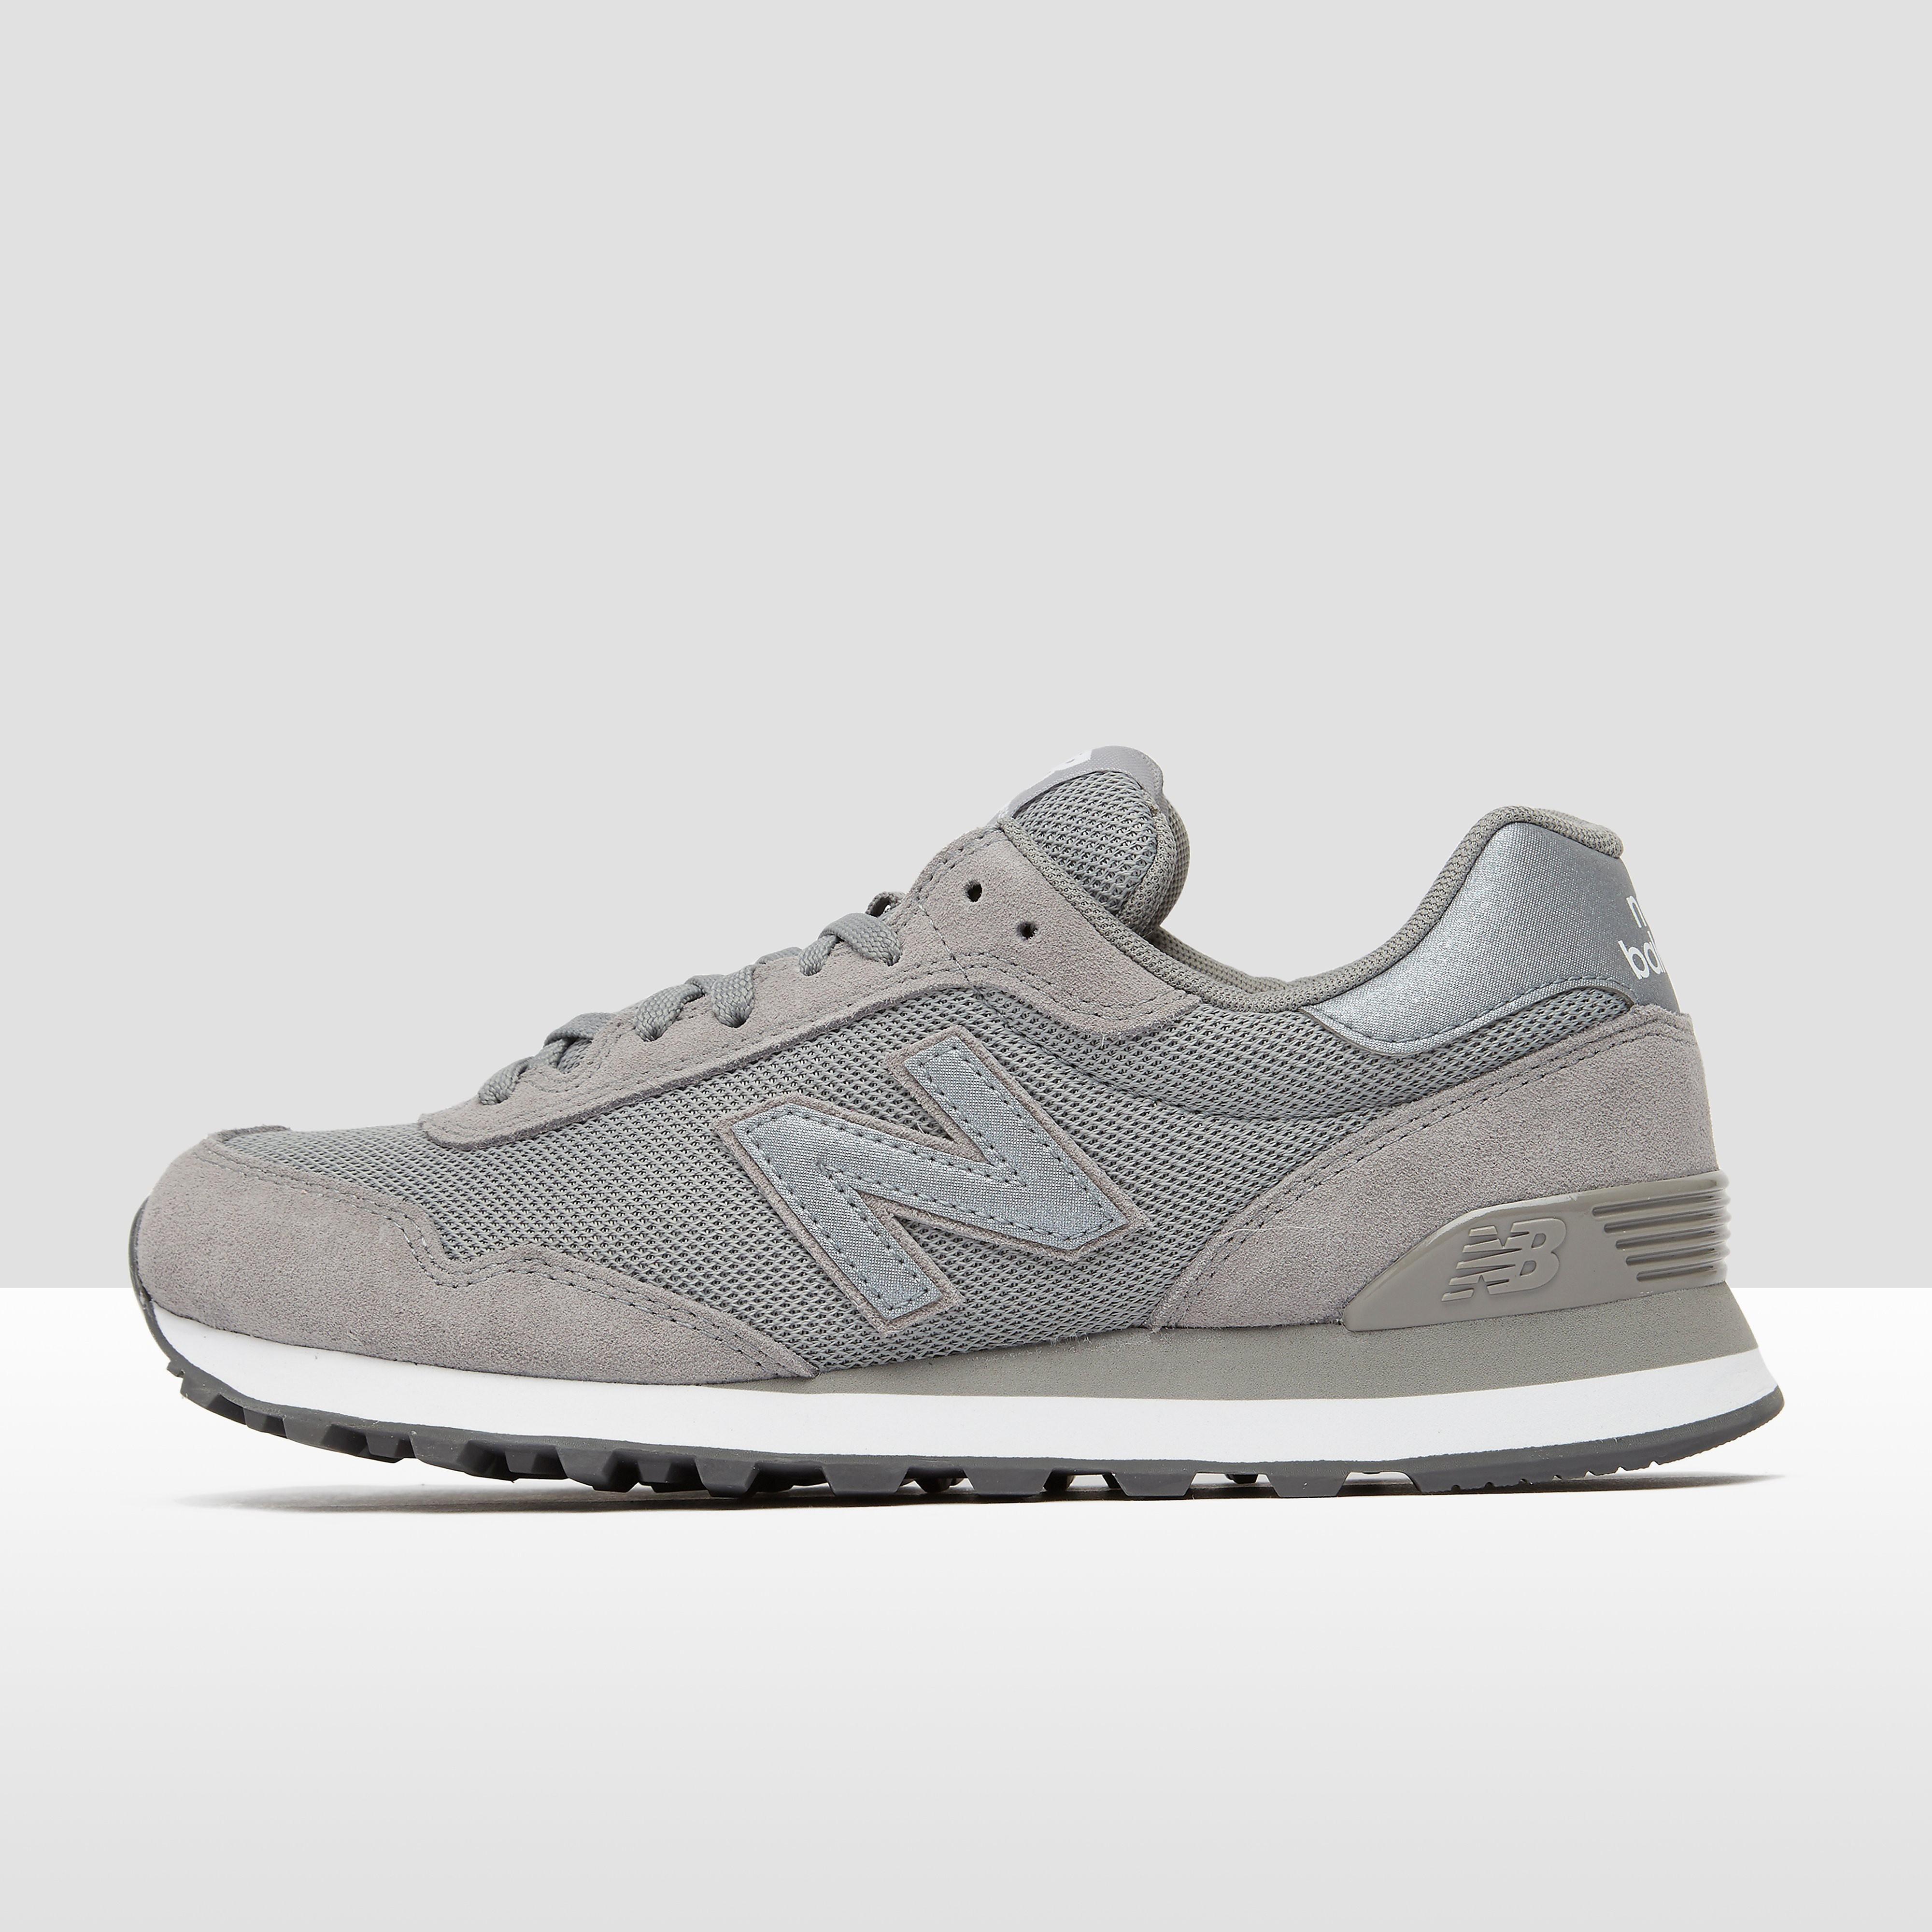 NEW BALANCE Wl515 sneakers grijs dames Dames